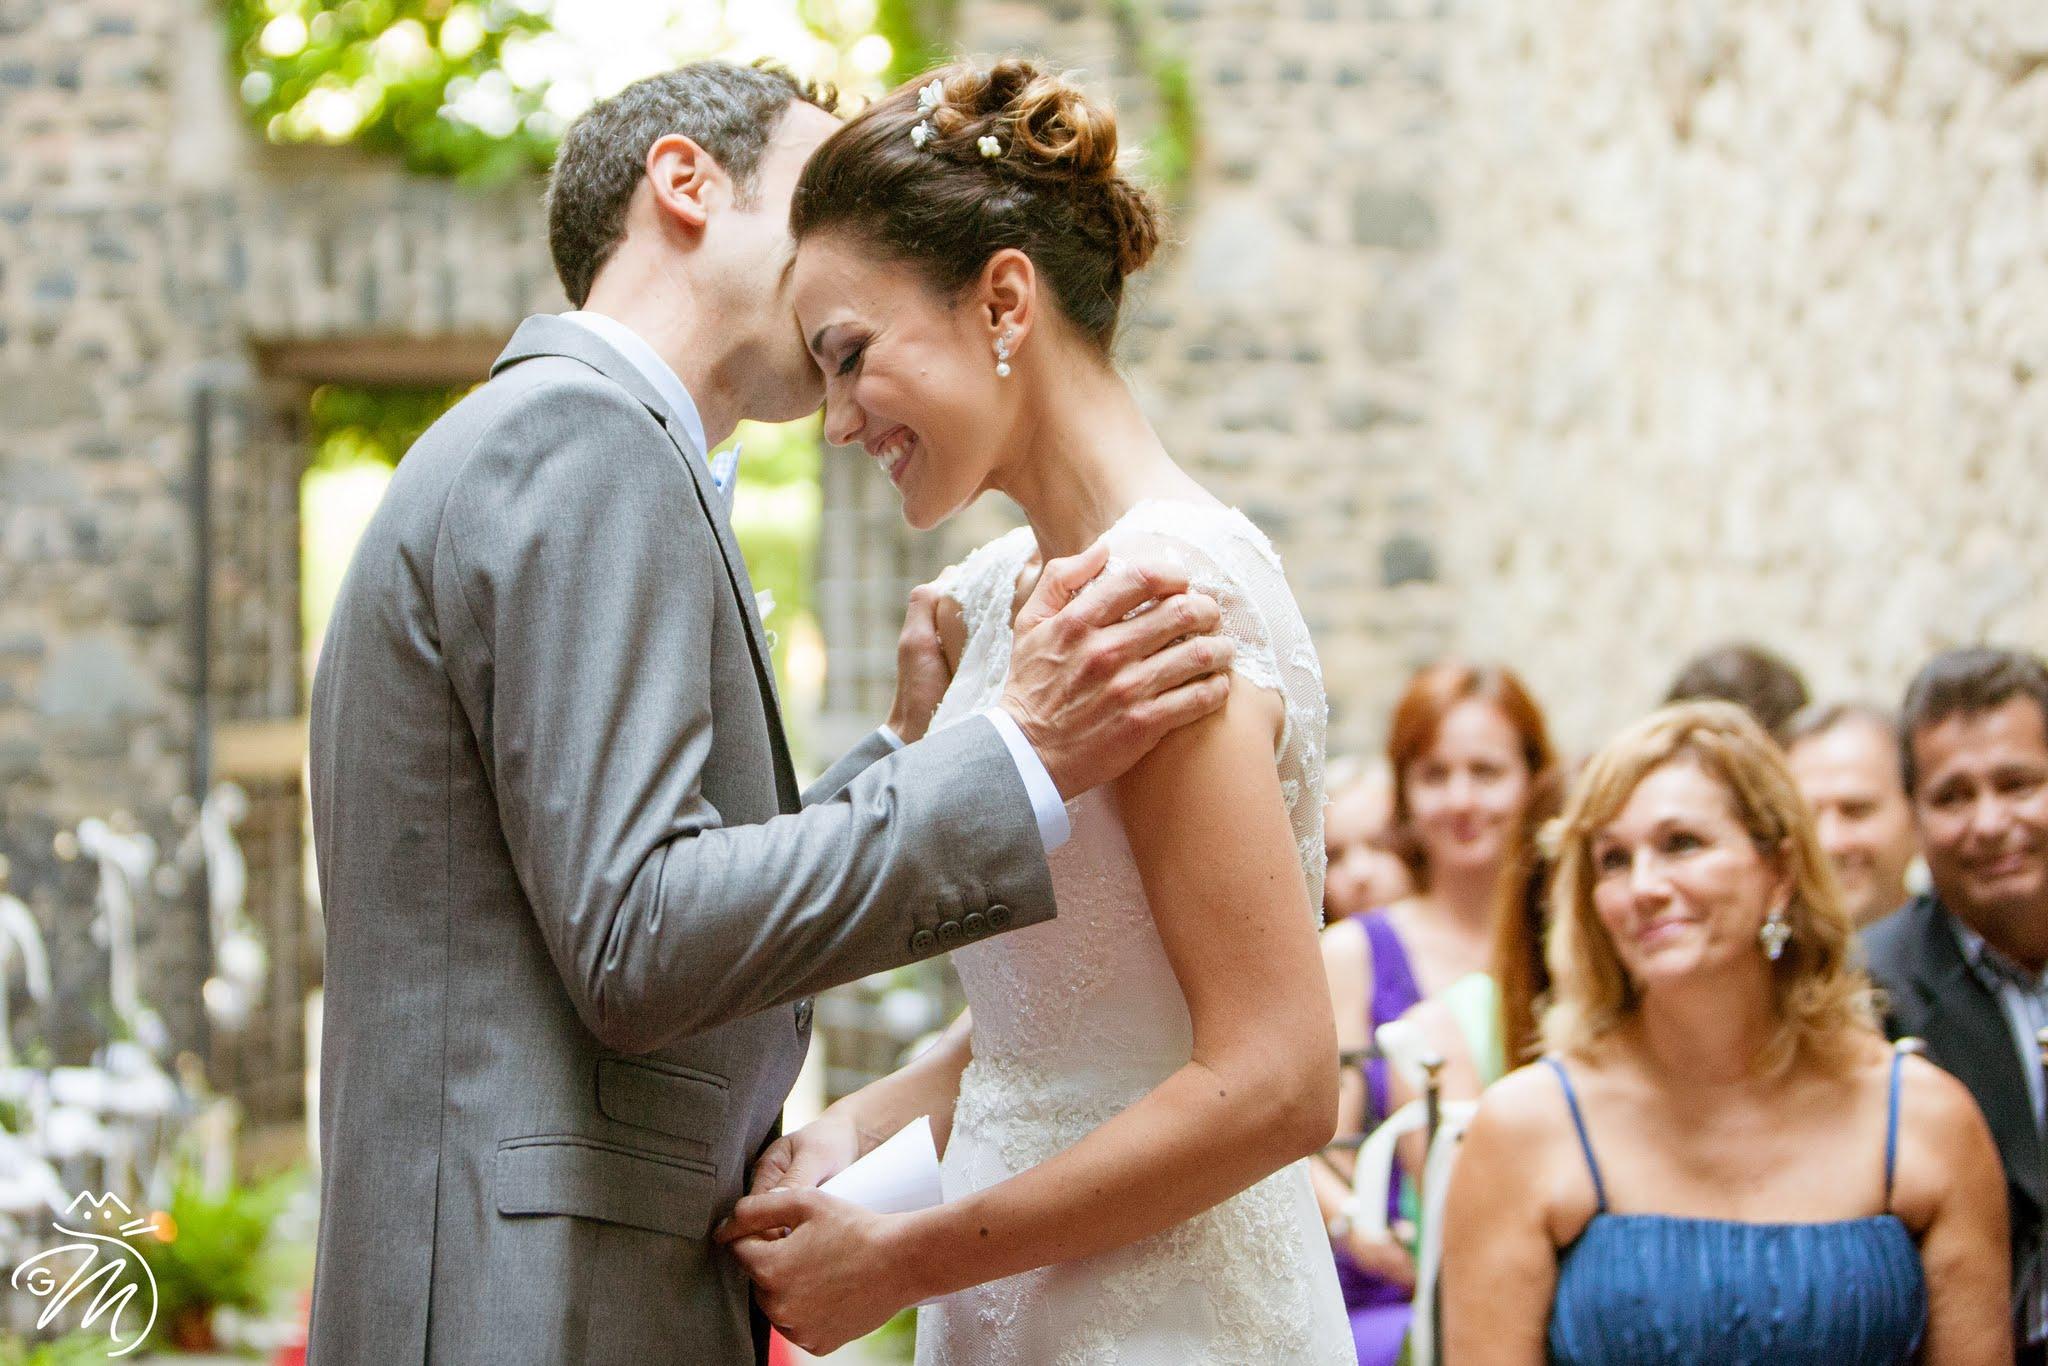 fotografo matrimonio Roma photographer in Italy ORIZZONTALI2_LOGO_HOME_PAGE_INTERNATIONAL_PHOTOGRAPHER_IN_ROME_WEDDING_DESTINATION_GIROLAMO_MONTELEONE_-3